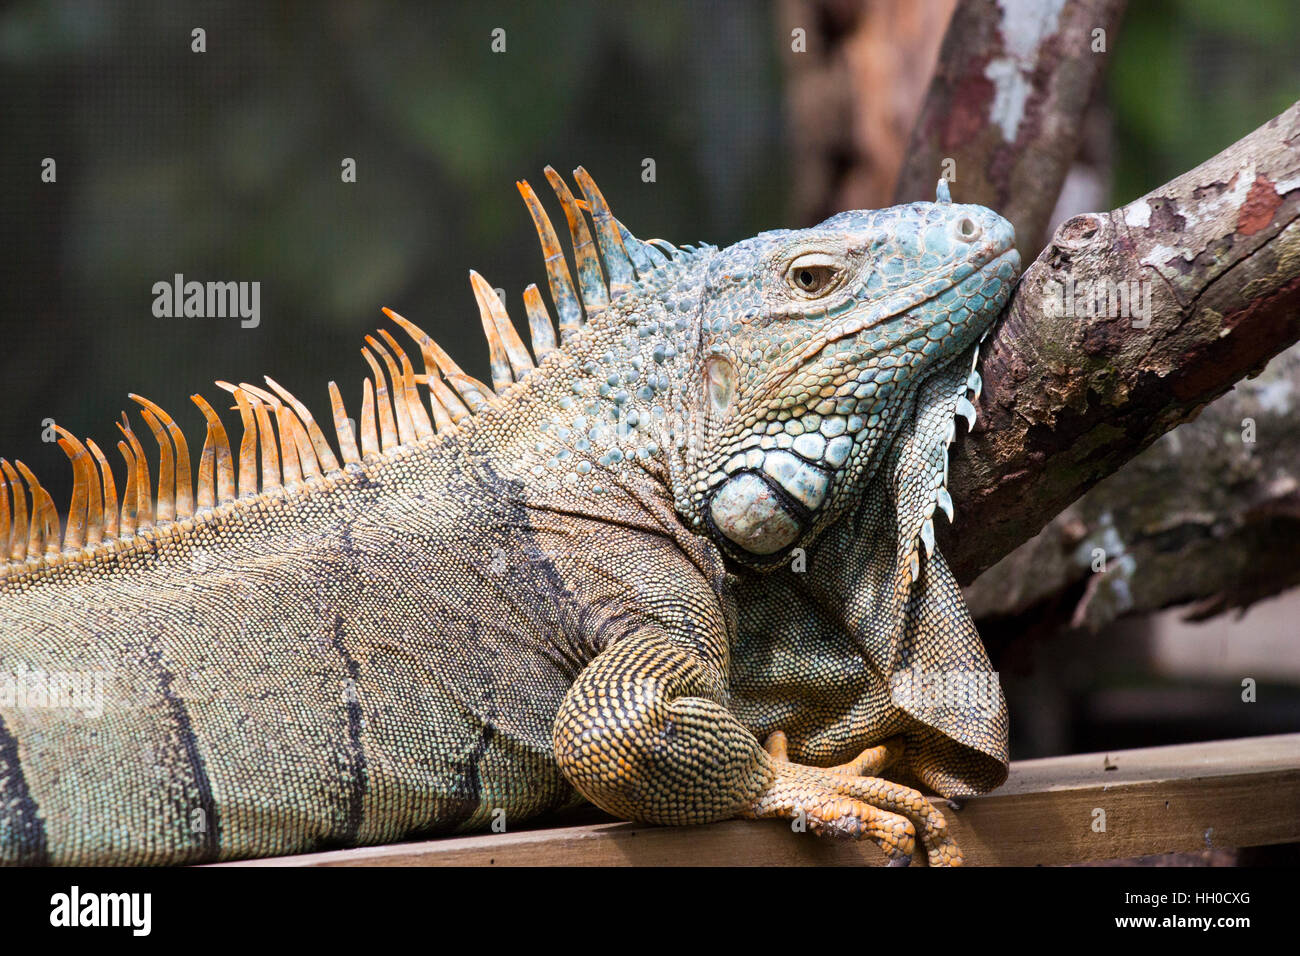 Green Iguana, Green Iguana Conservation Project, San Ignacio, Belize - Stock Image